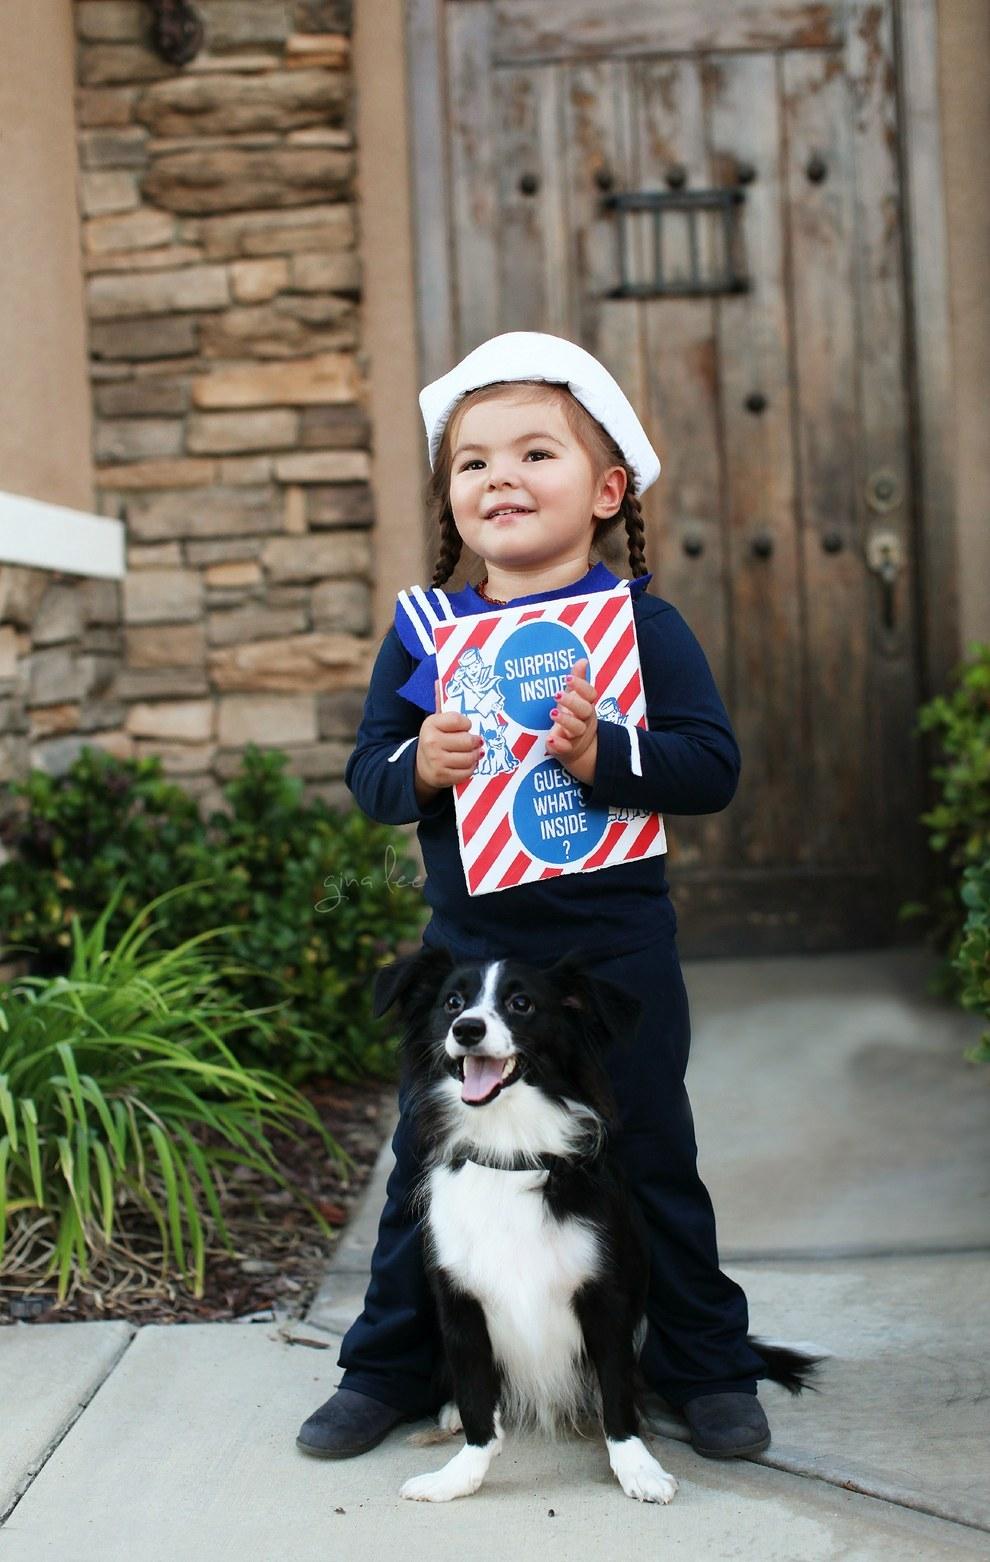 She was the sailor on the Cracker Jacks box...